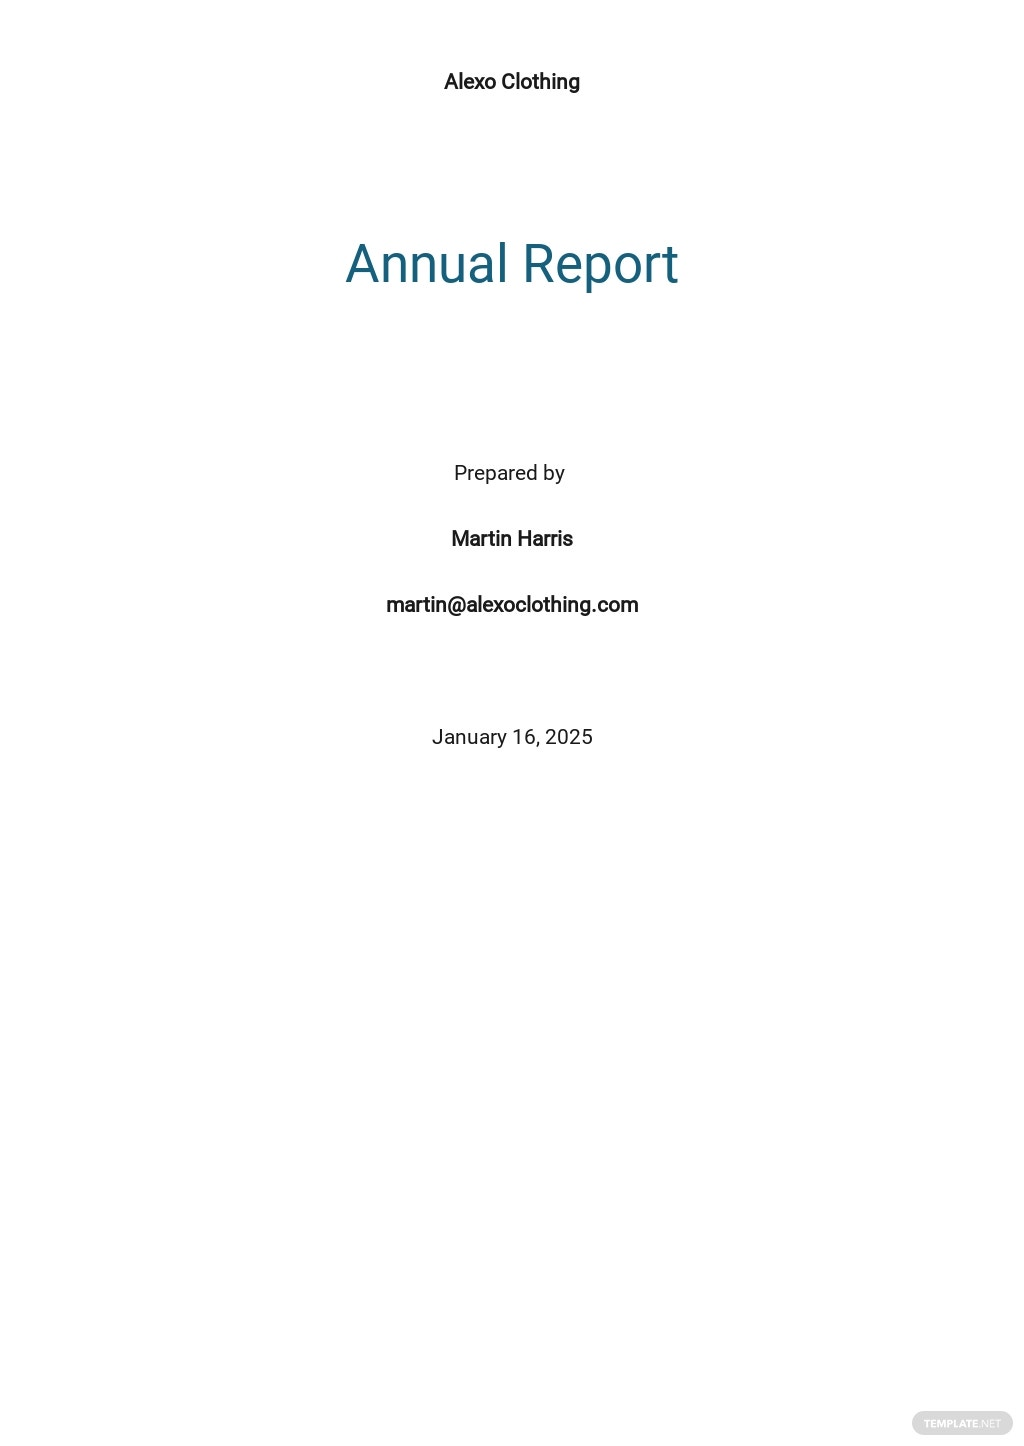 Simple Annual Report Template.jpe